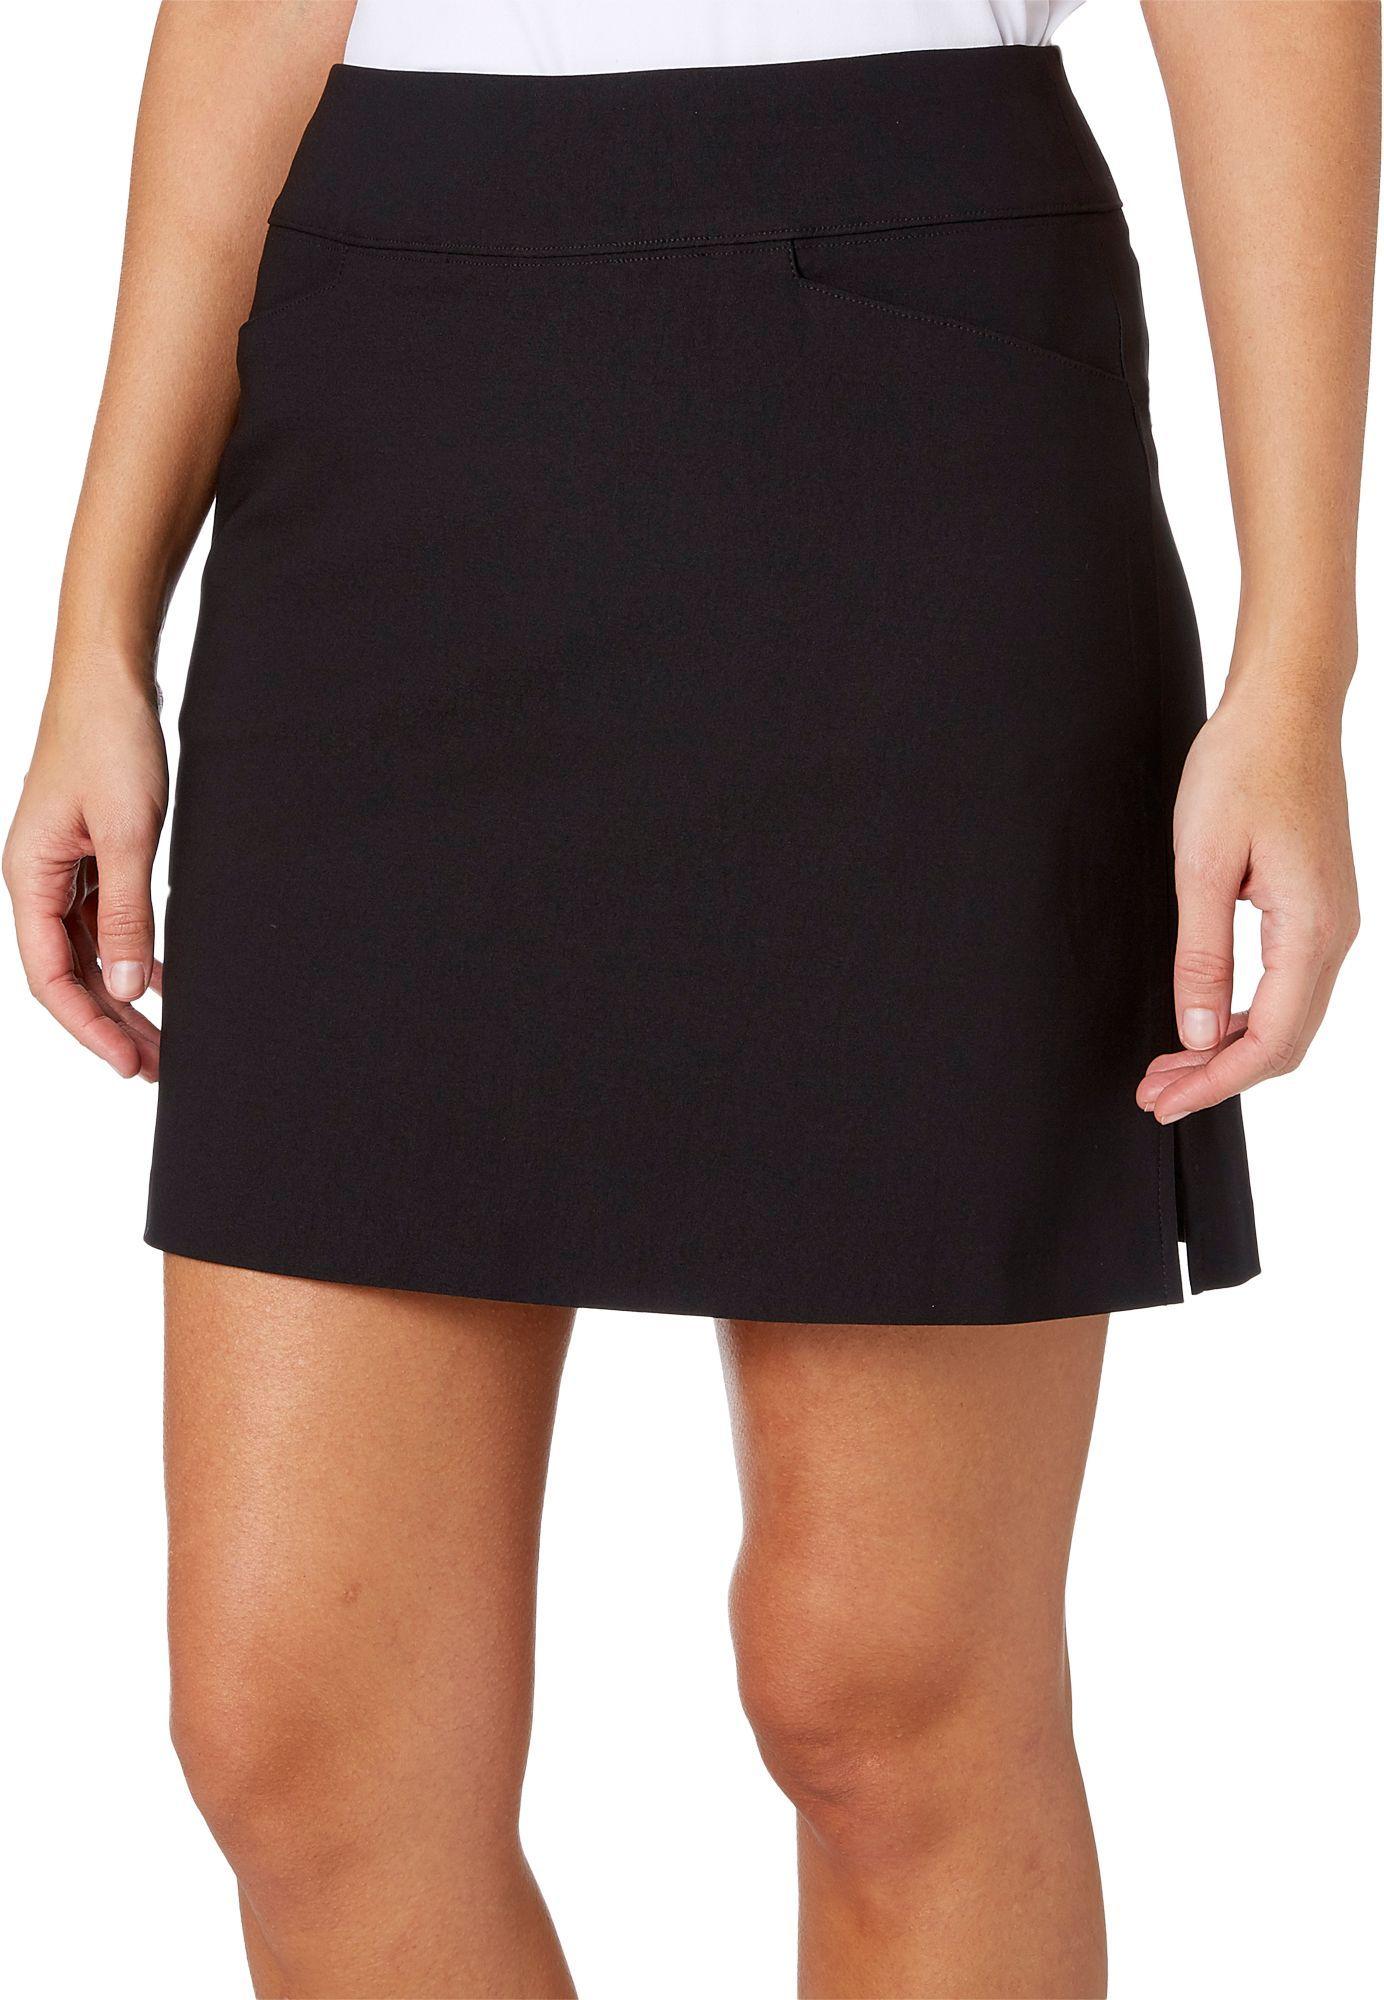 7d0768474 Women's Apt. 9® Tummy Control Pull-On Pencil Skirt   Products   Skirts,  Elastic waist skirt, Sequin skirt